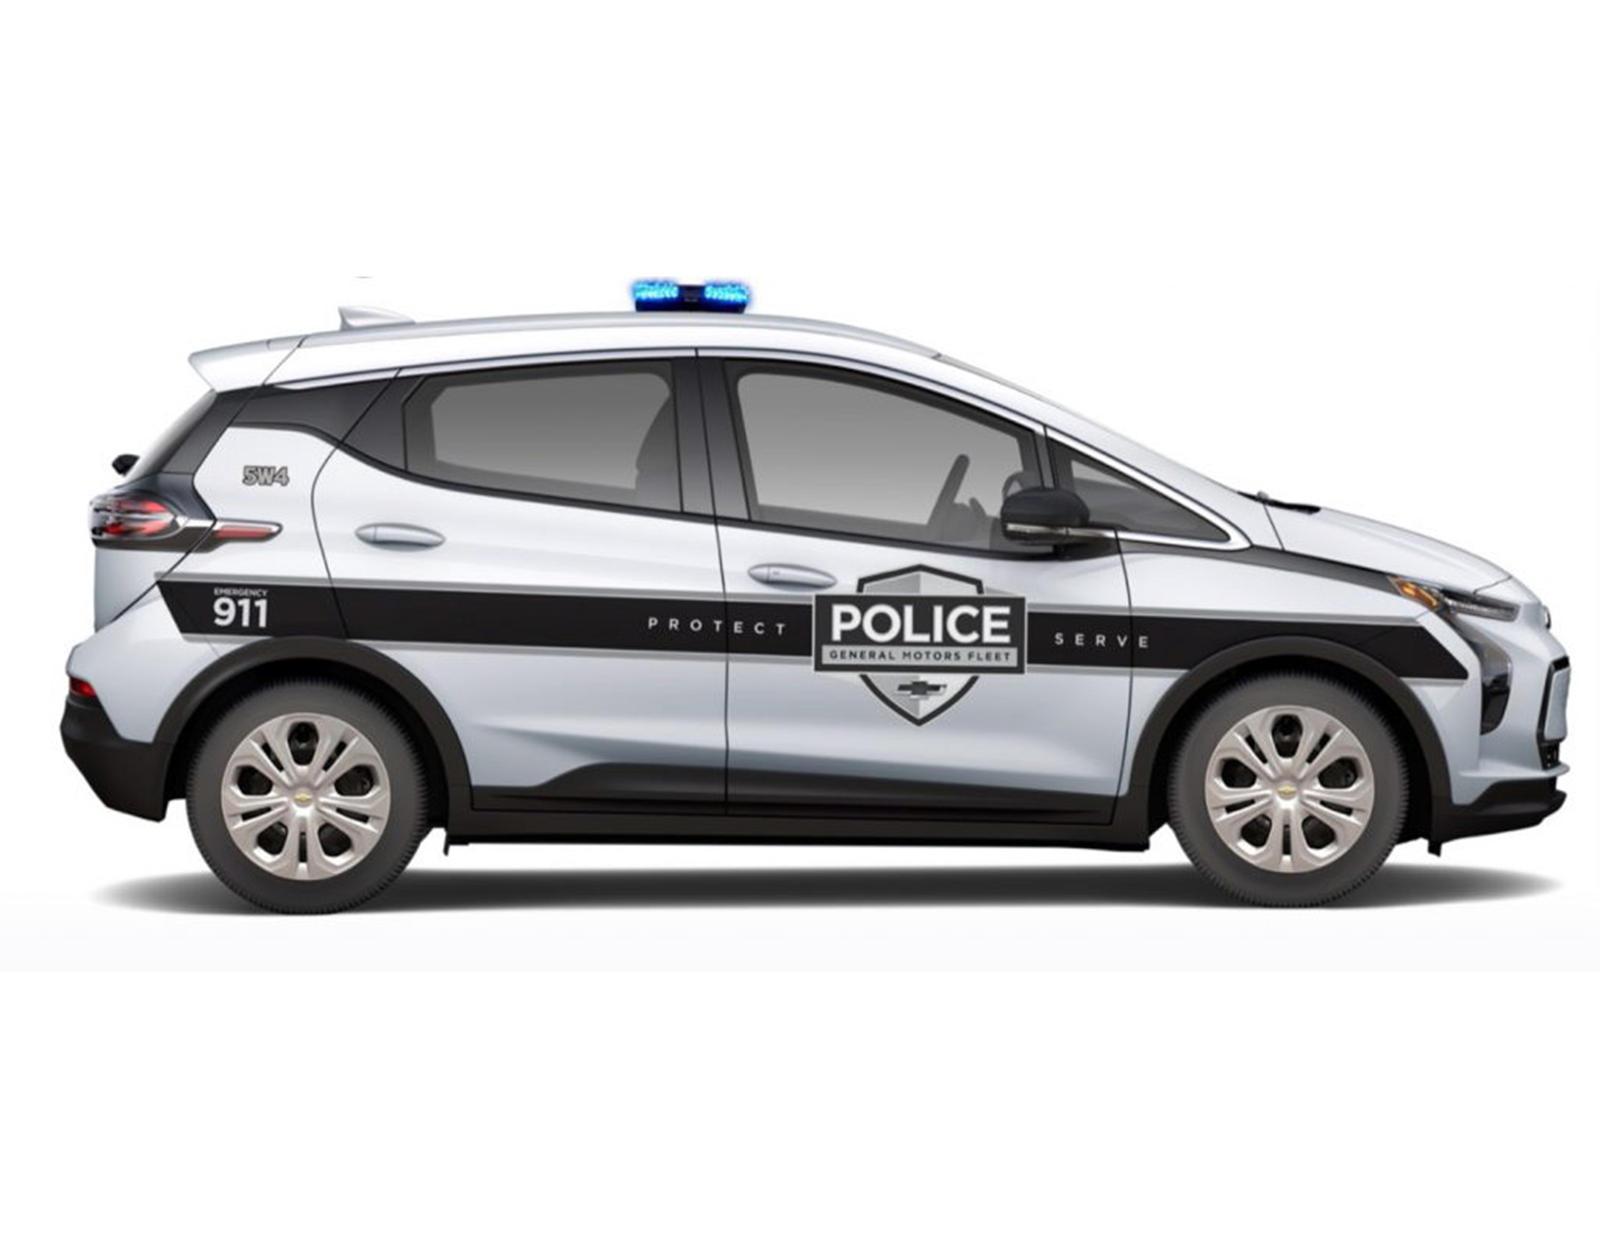 95701 2022 Chevrolet Bolt EV Cop Car Will Struggle To Catch Criminals